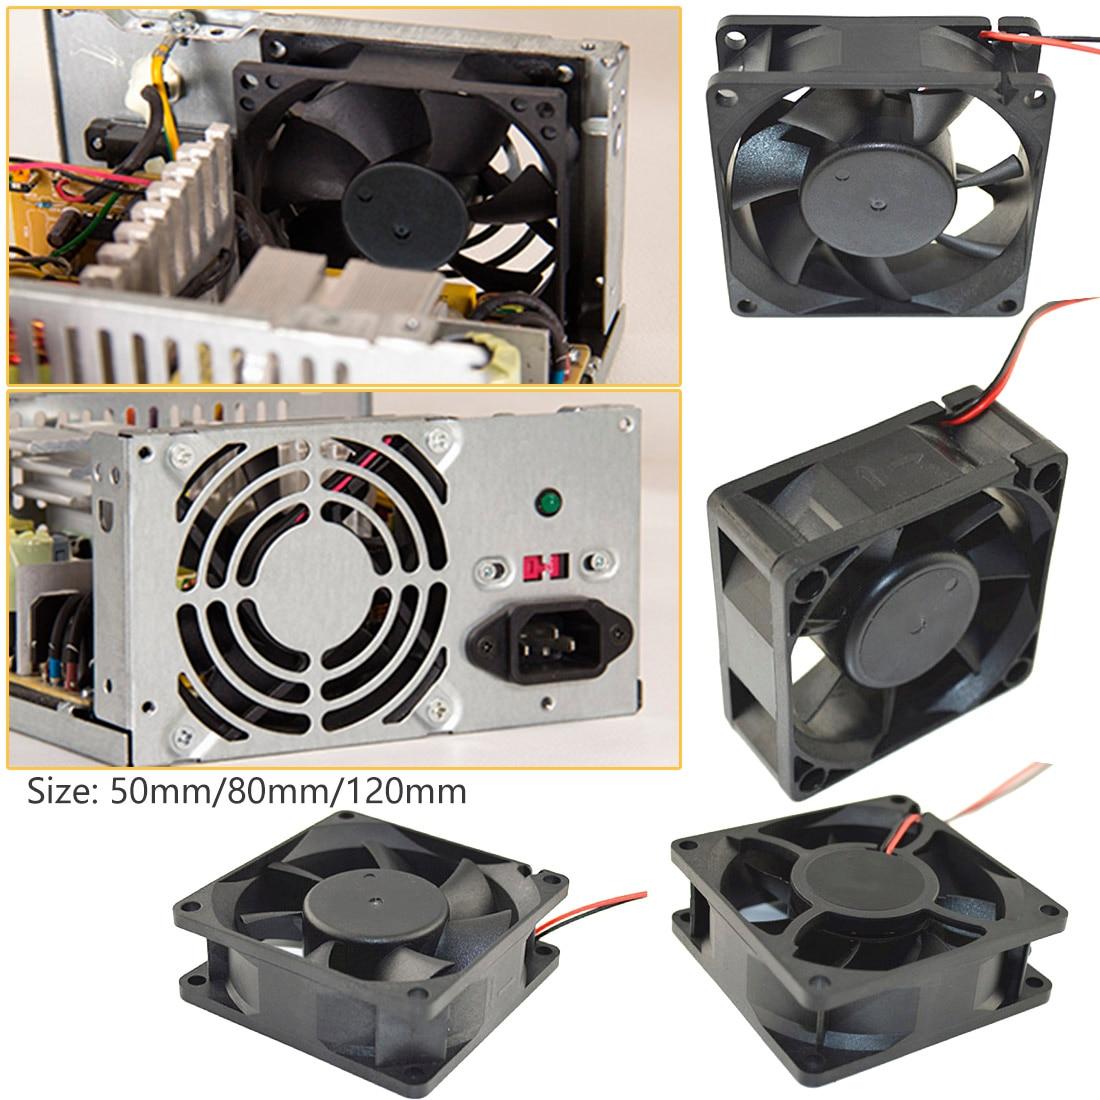 Rarido 1PC 120x120x25mm DC 12V 0.15A 3 Pin 9-Blade Computer Case Cooling Fan Cooler 12025